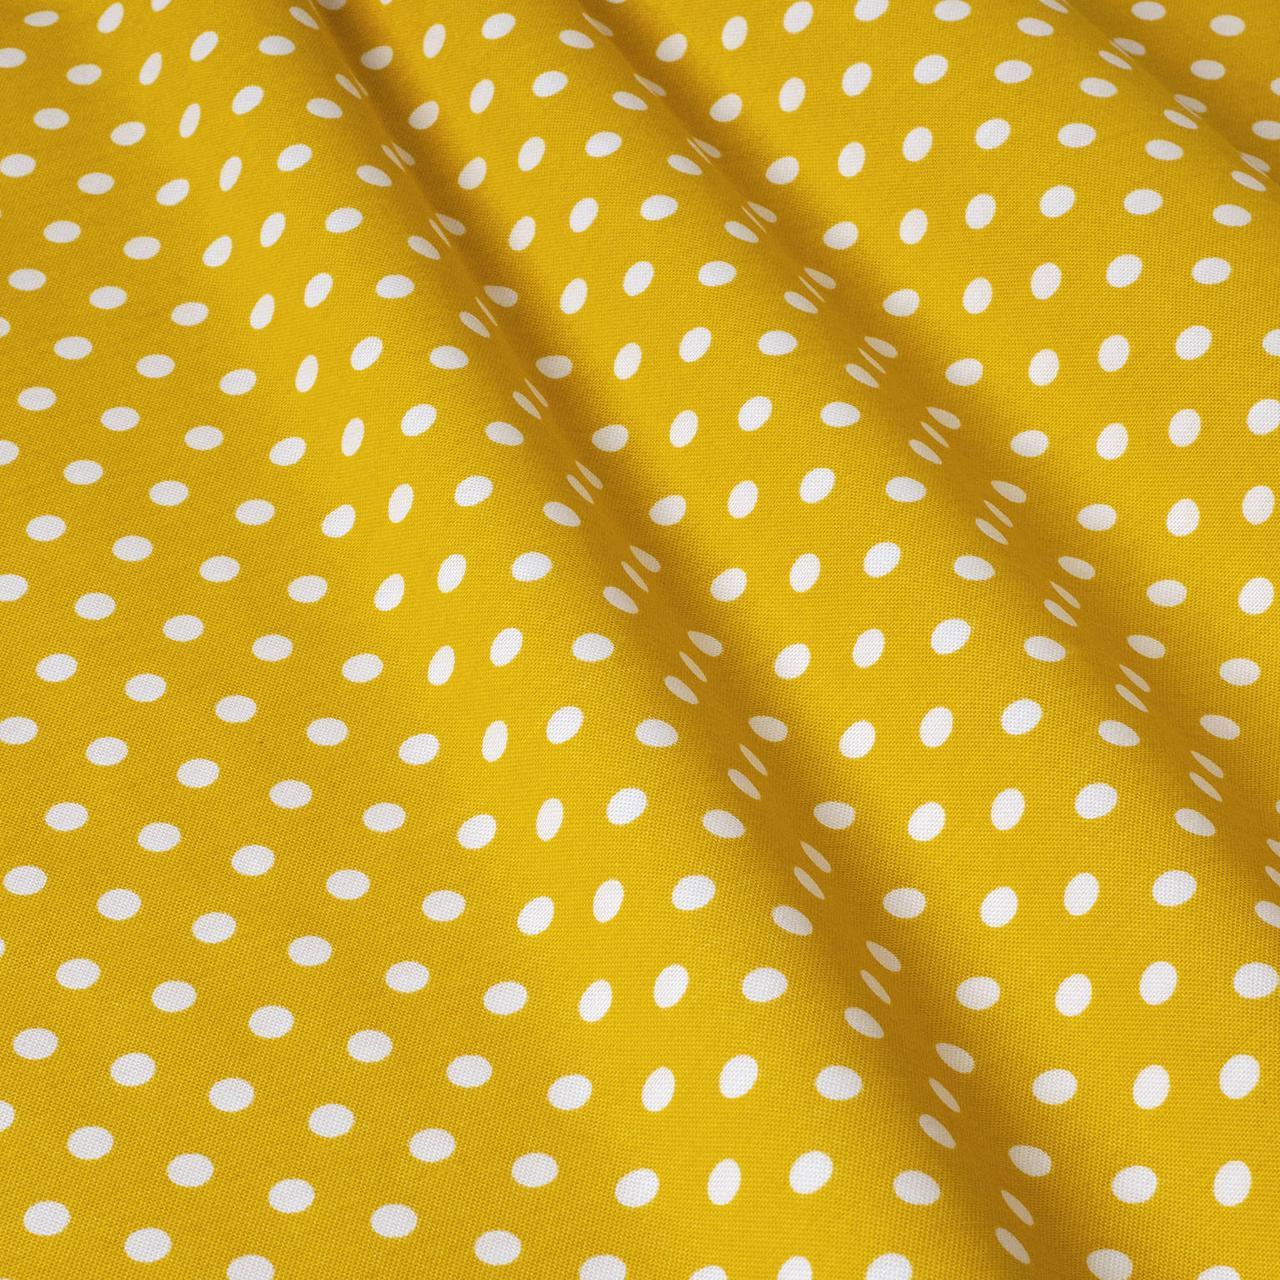 Декоративная ткань горох на желтом фоне Турция 81481v5